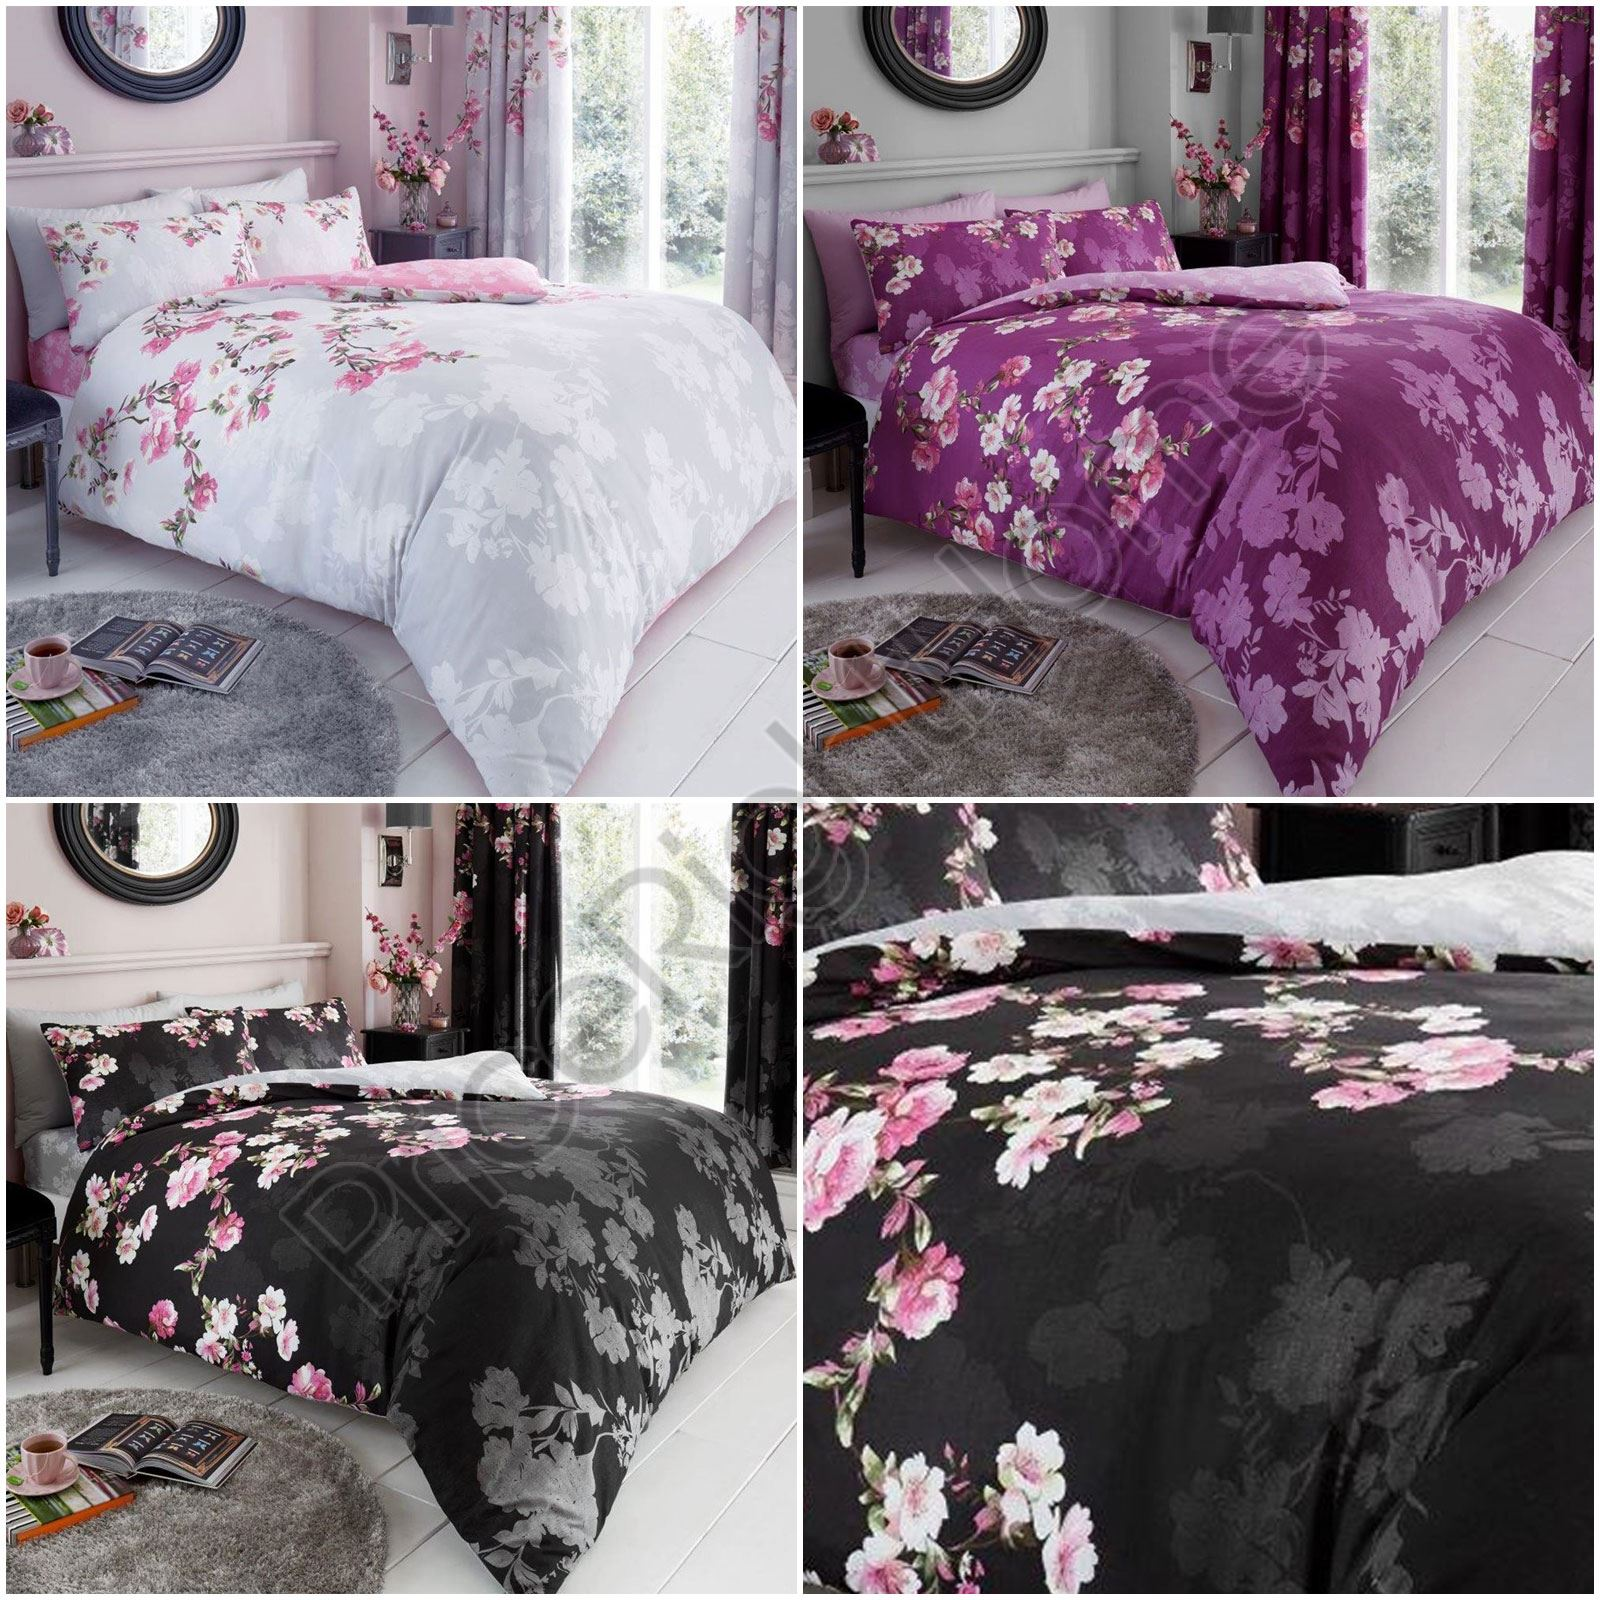 Roseanne Flower Duvet Quilt Cover Polycotton Floral Printed Bedding Set